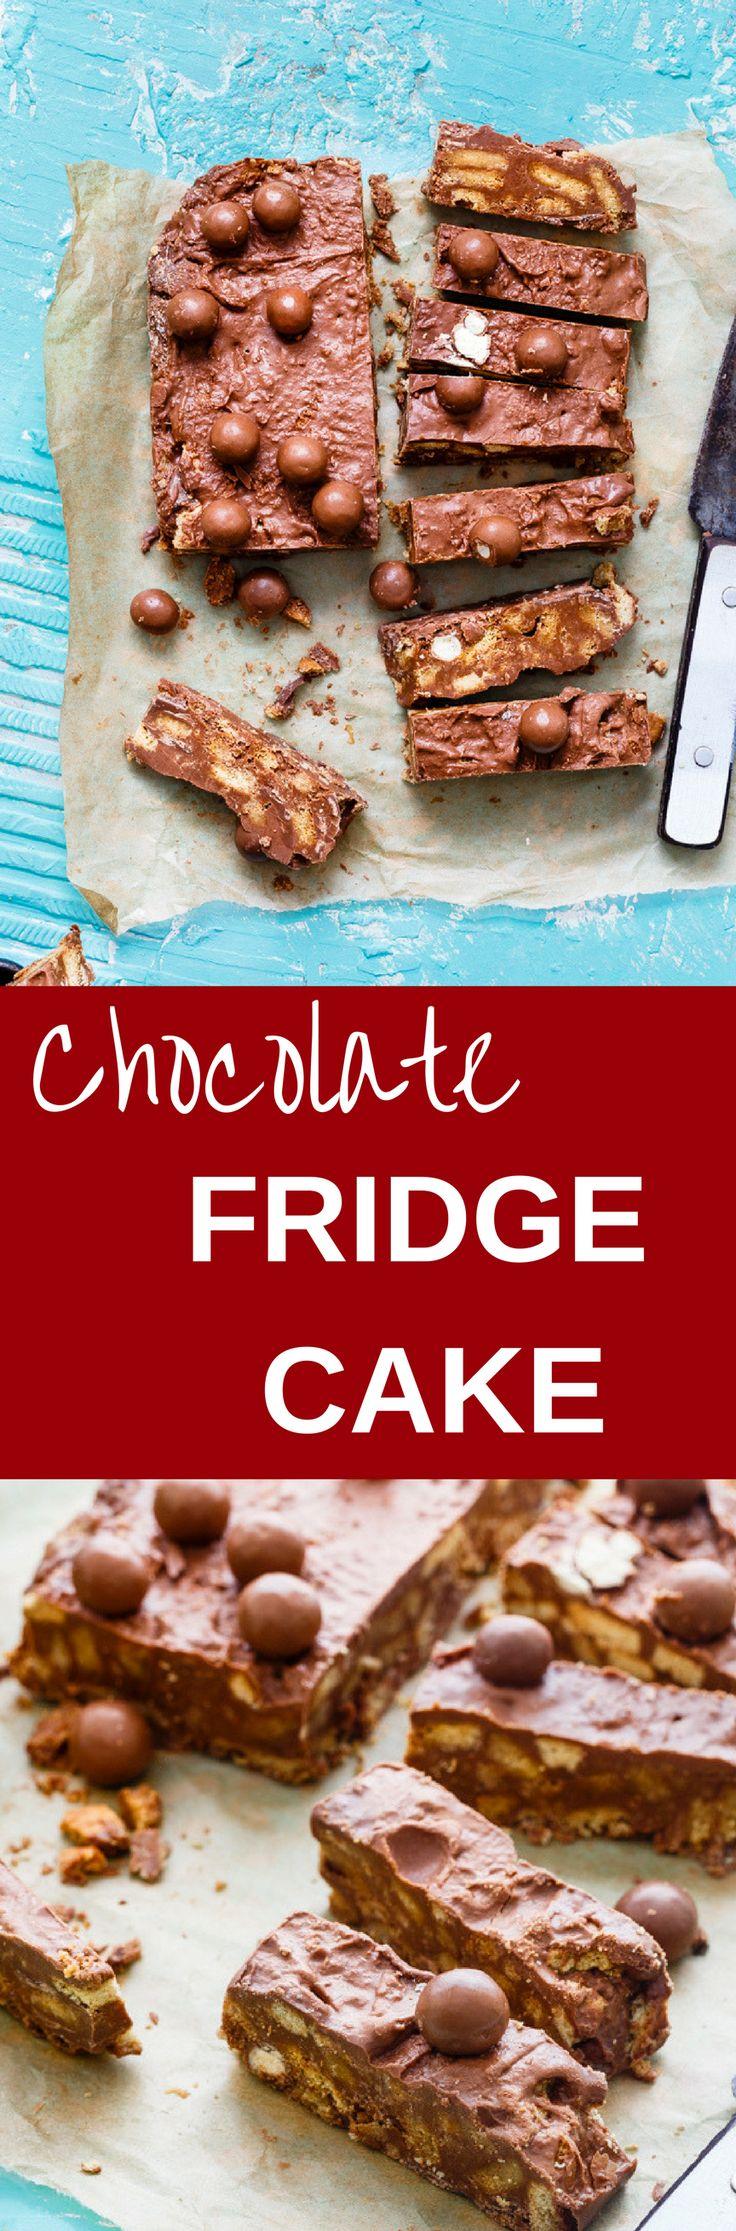 Chocolate fridge cake recipe chocolate fridge cake